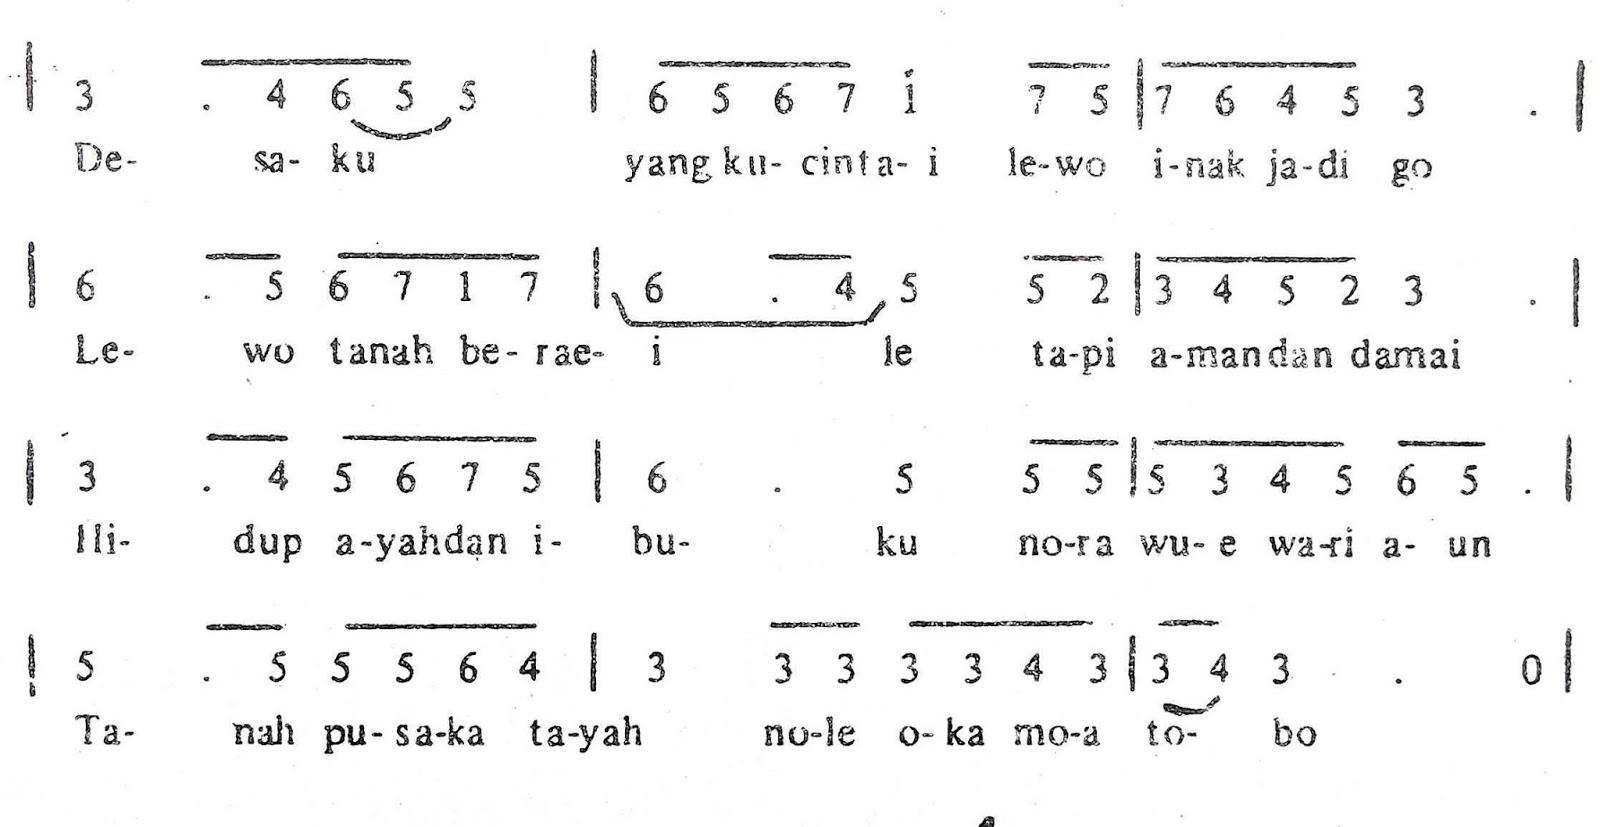 Chord & Arti Lirik Lagu Nusa Tenggara Timur: Desaku + Not Angka